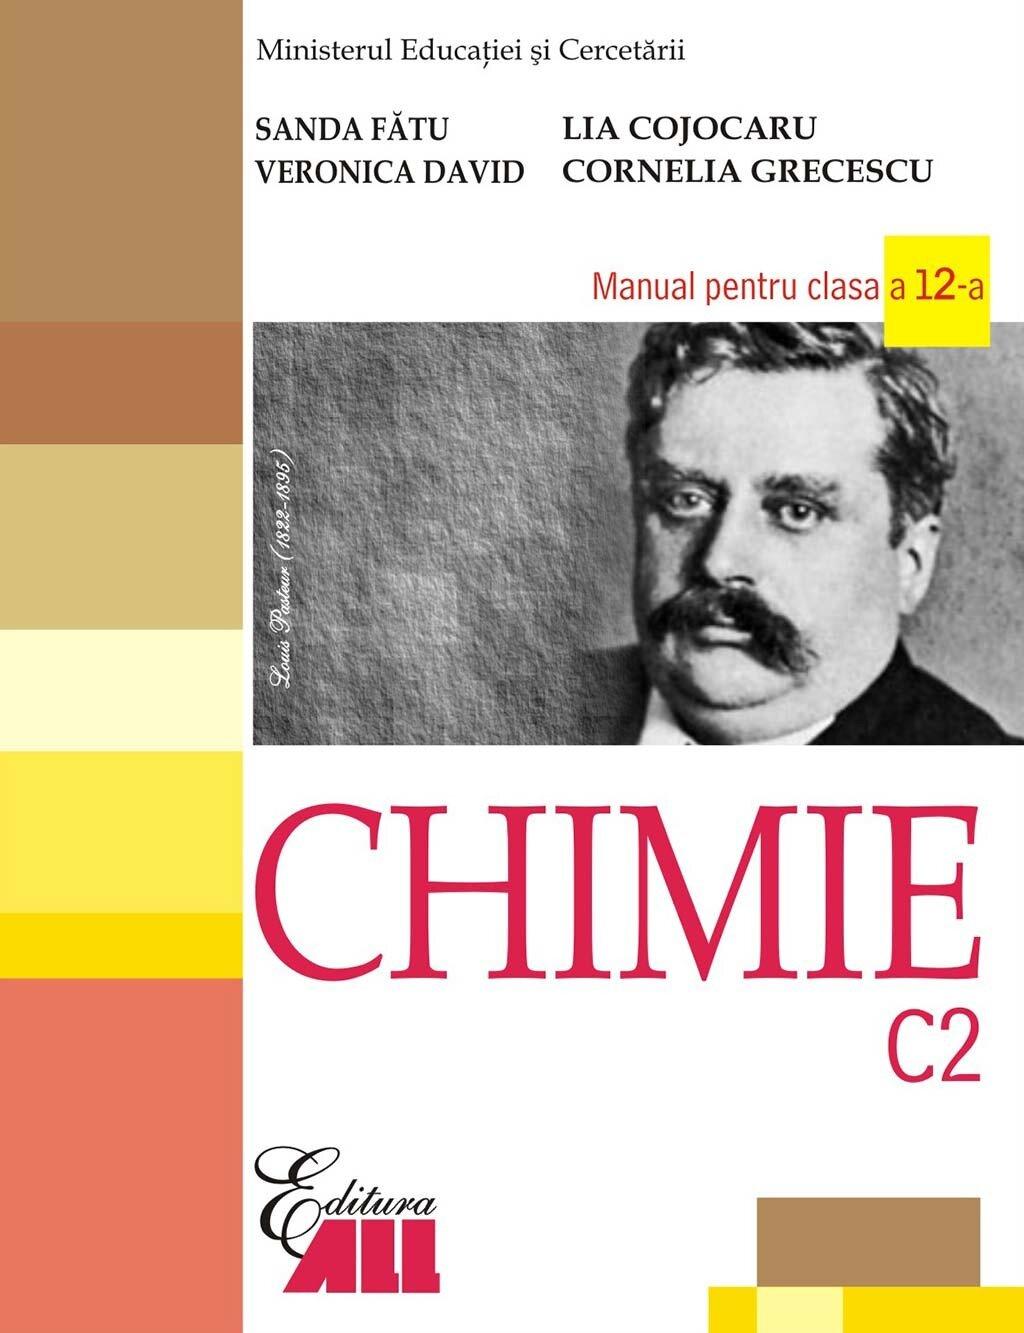 Chimie C2. Manual pentru clasa a 12-a (eBook)